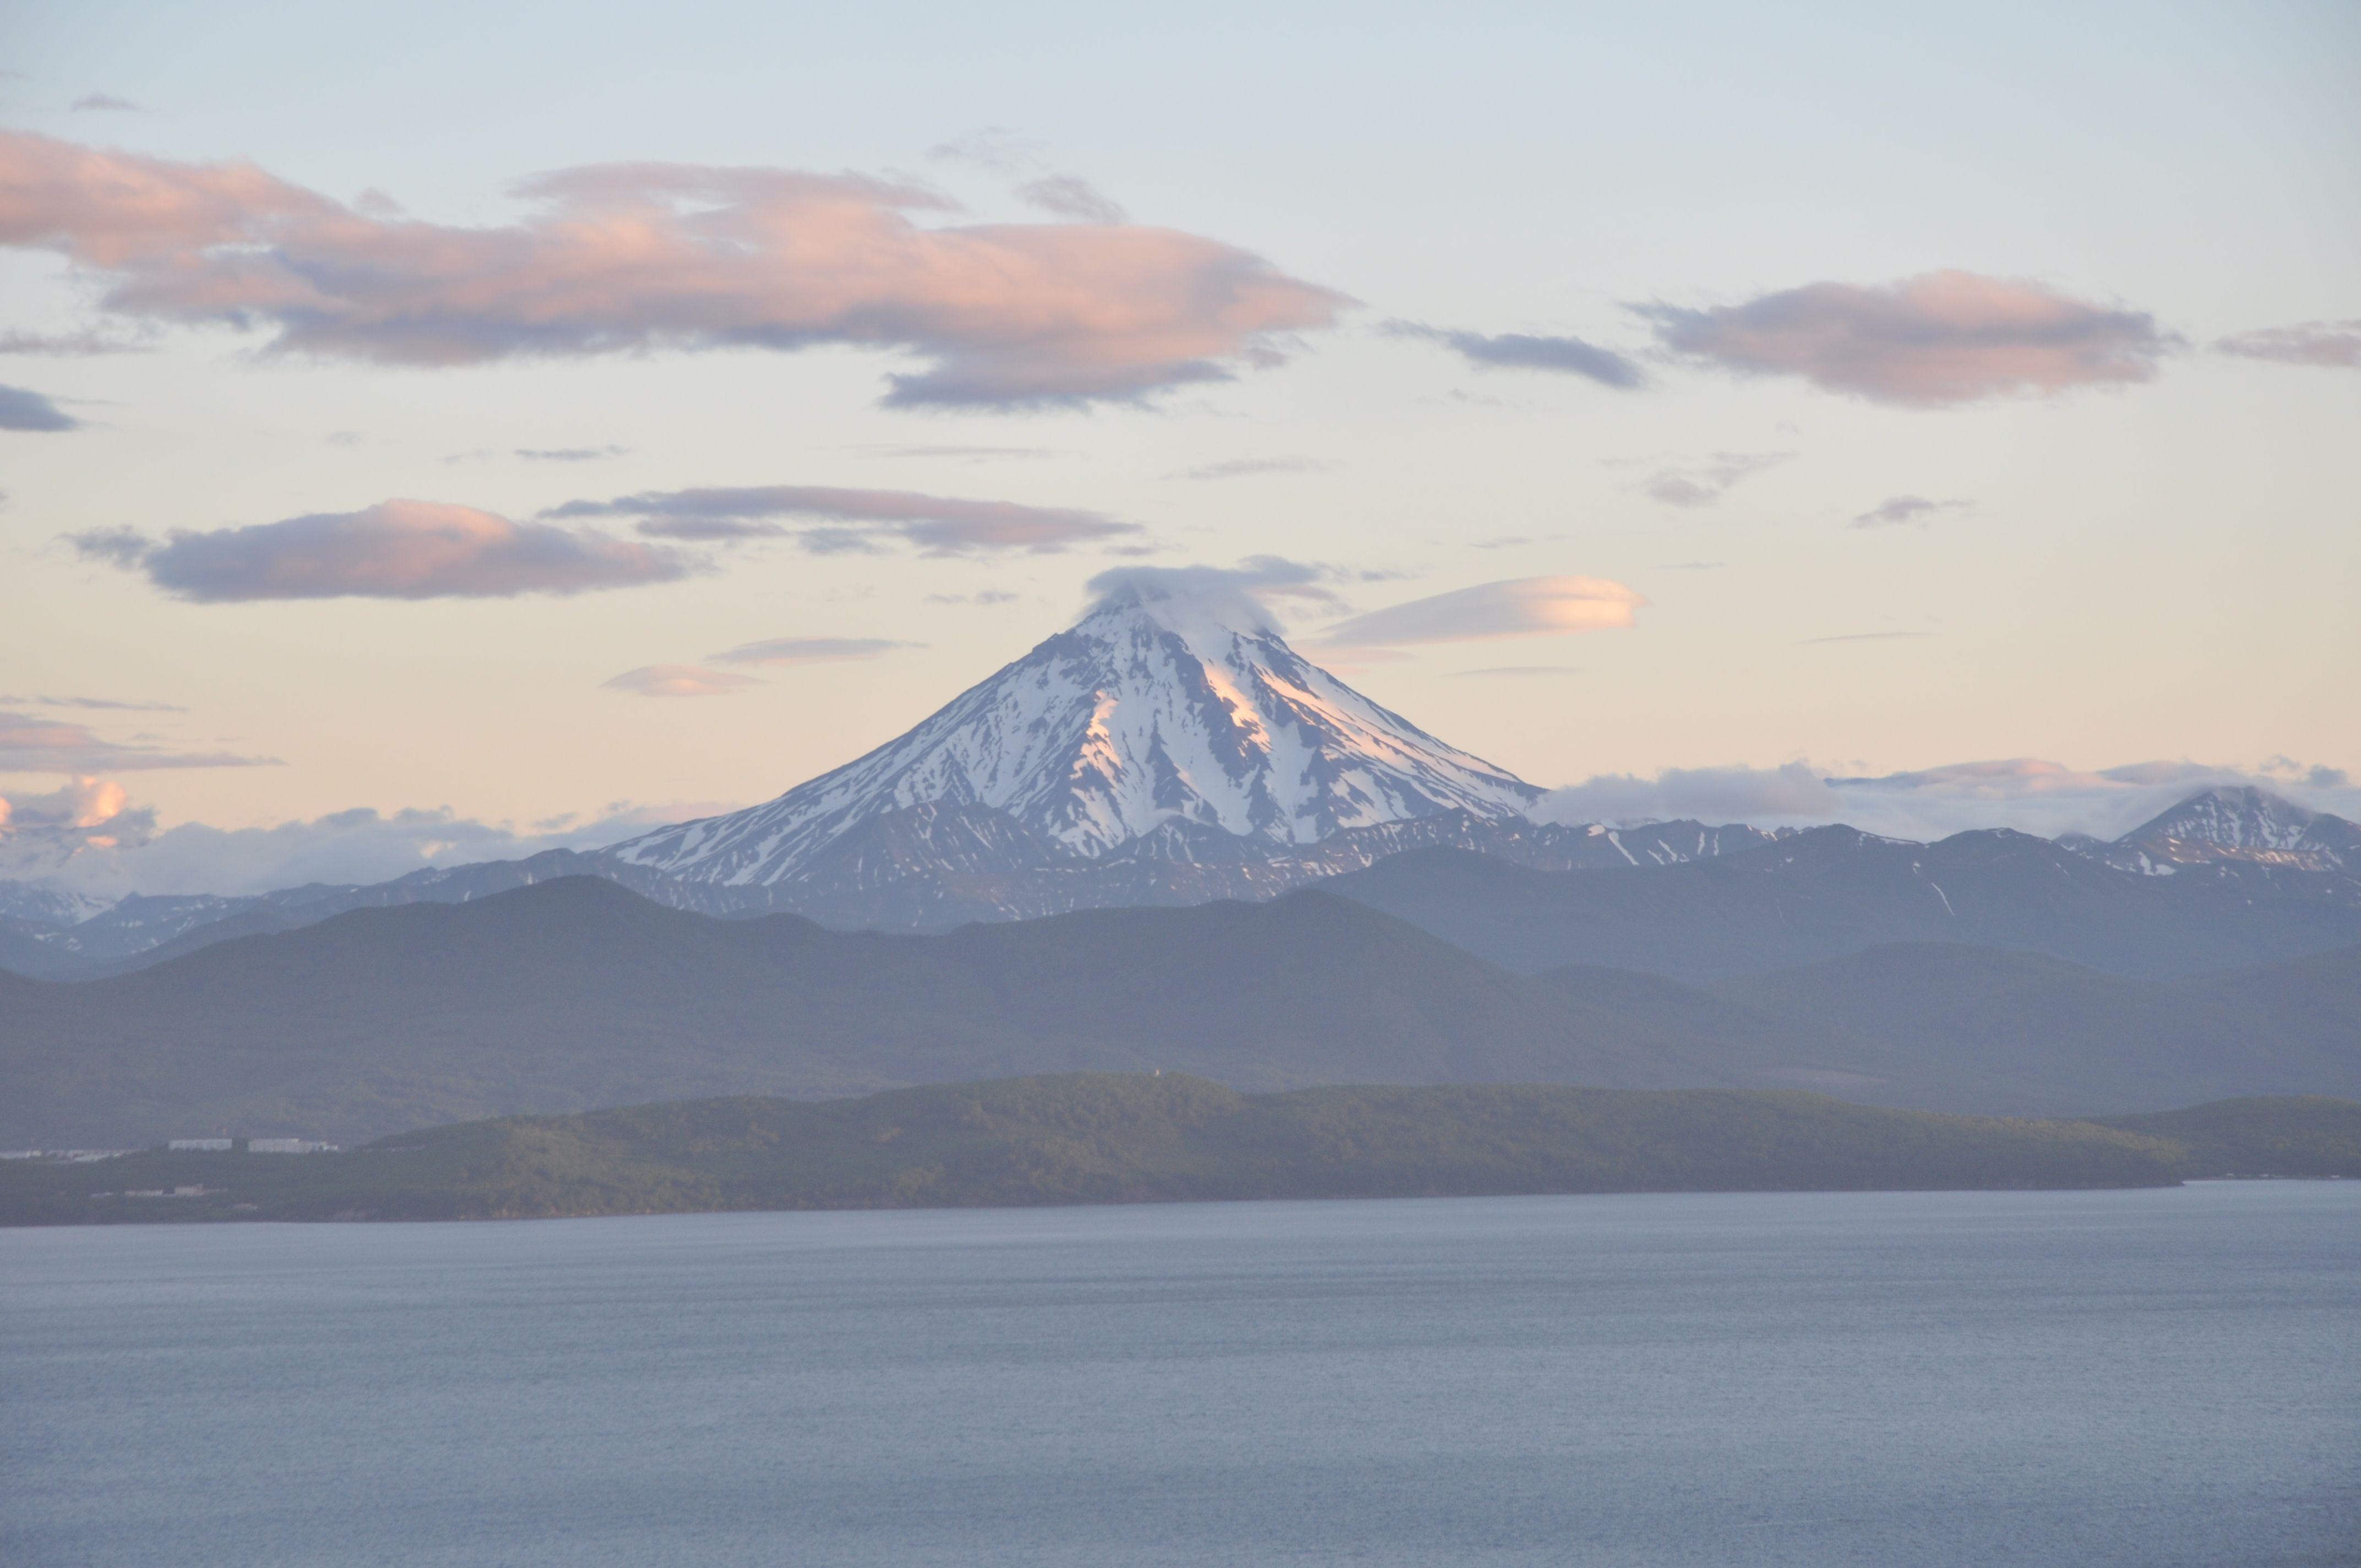 Вилючинский вулкан. Камчатка #kamchatka #volkano #Камчатка #вулканы